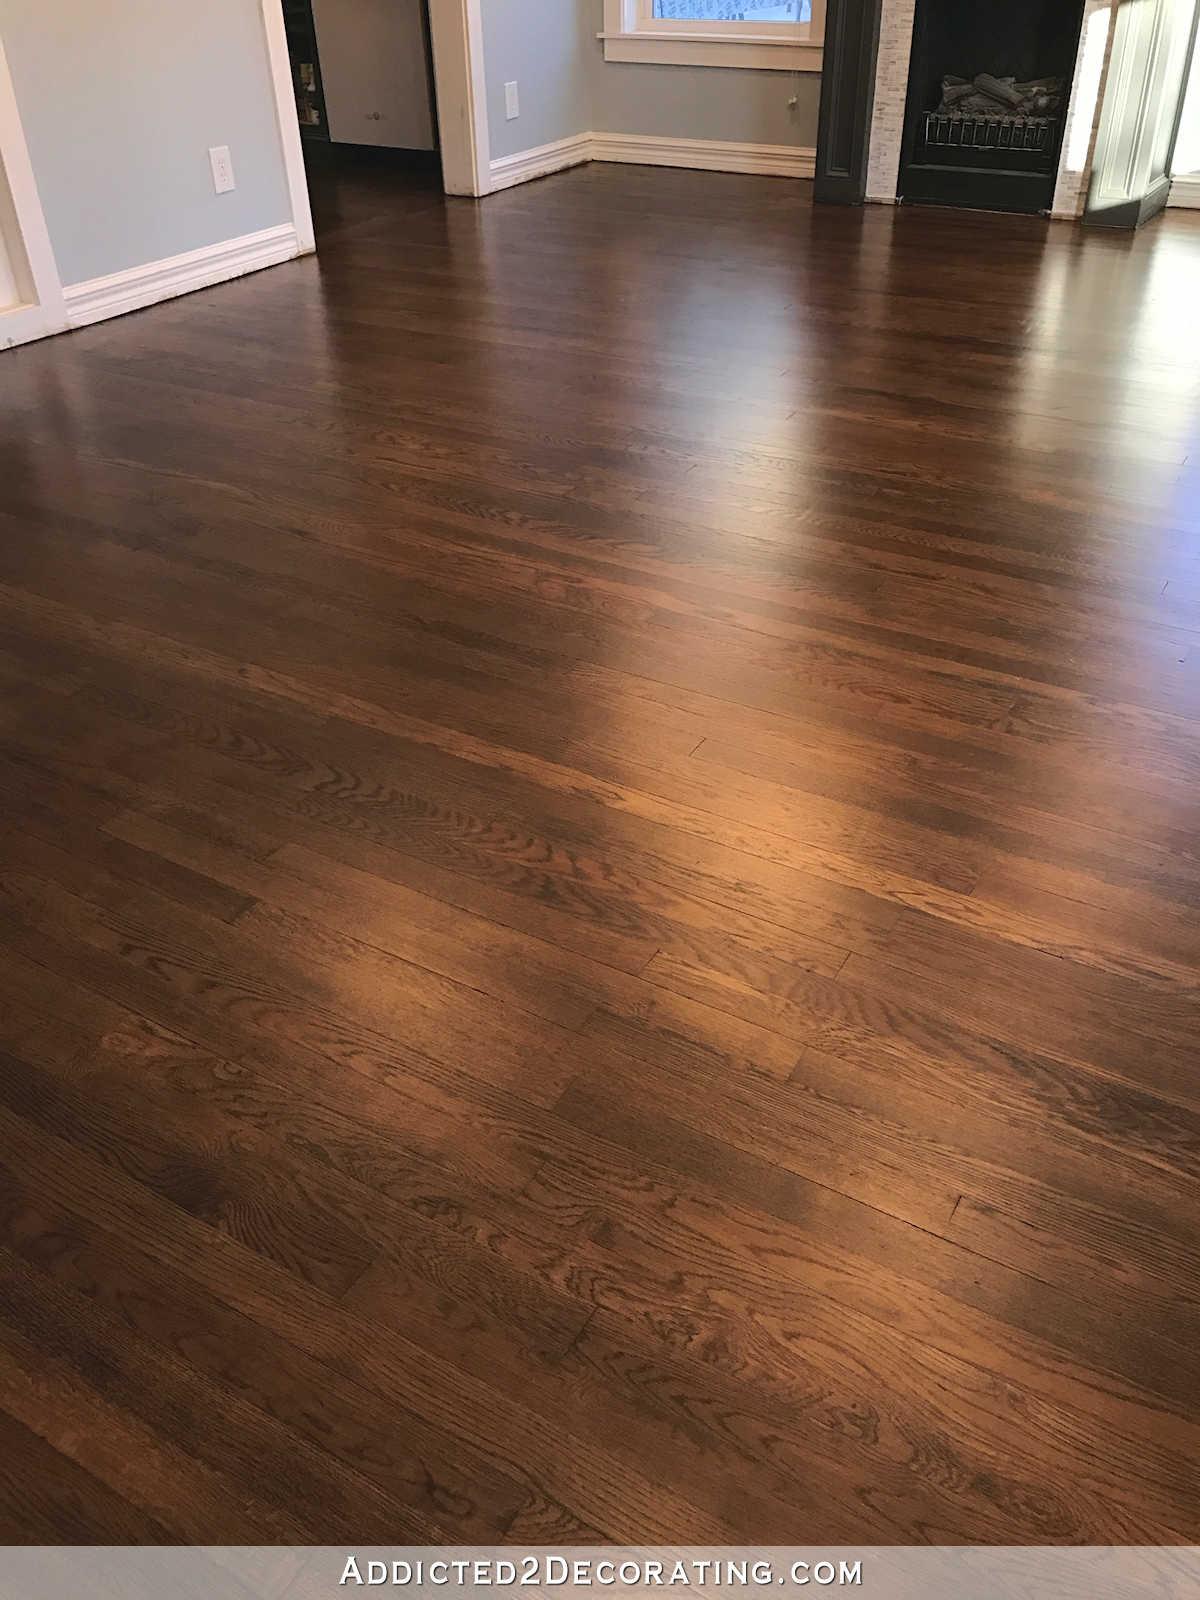 oak floors refinished red oak hardwood floors - entryway and living room XZEMTAE